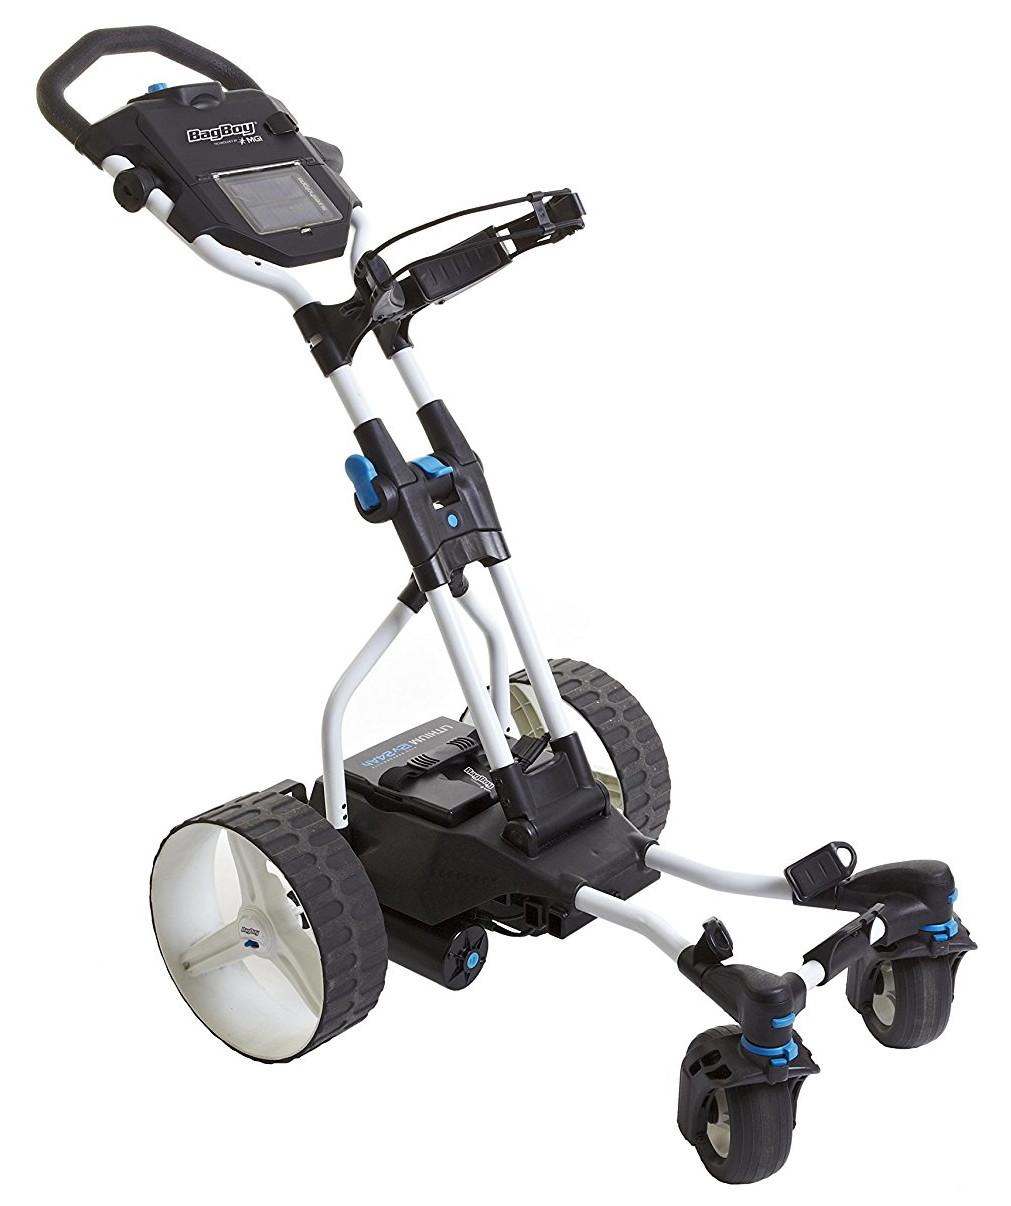 Bag Boy Quad Navigator Electric Golf Carts